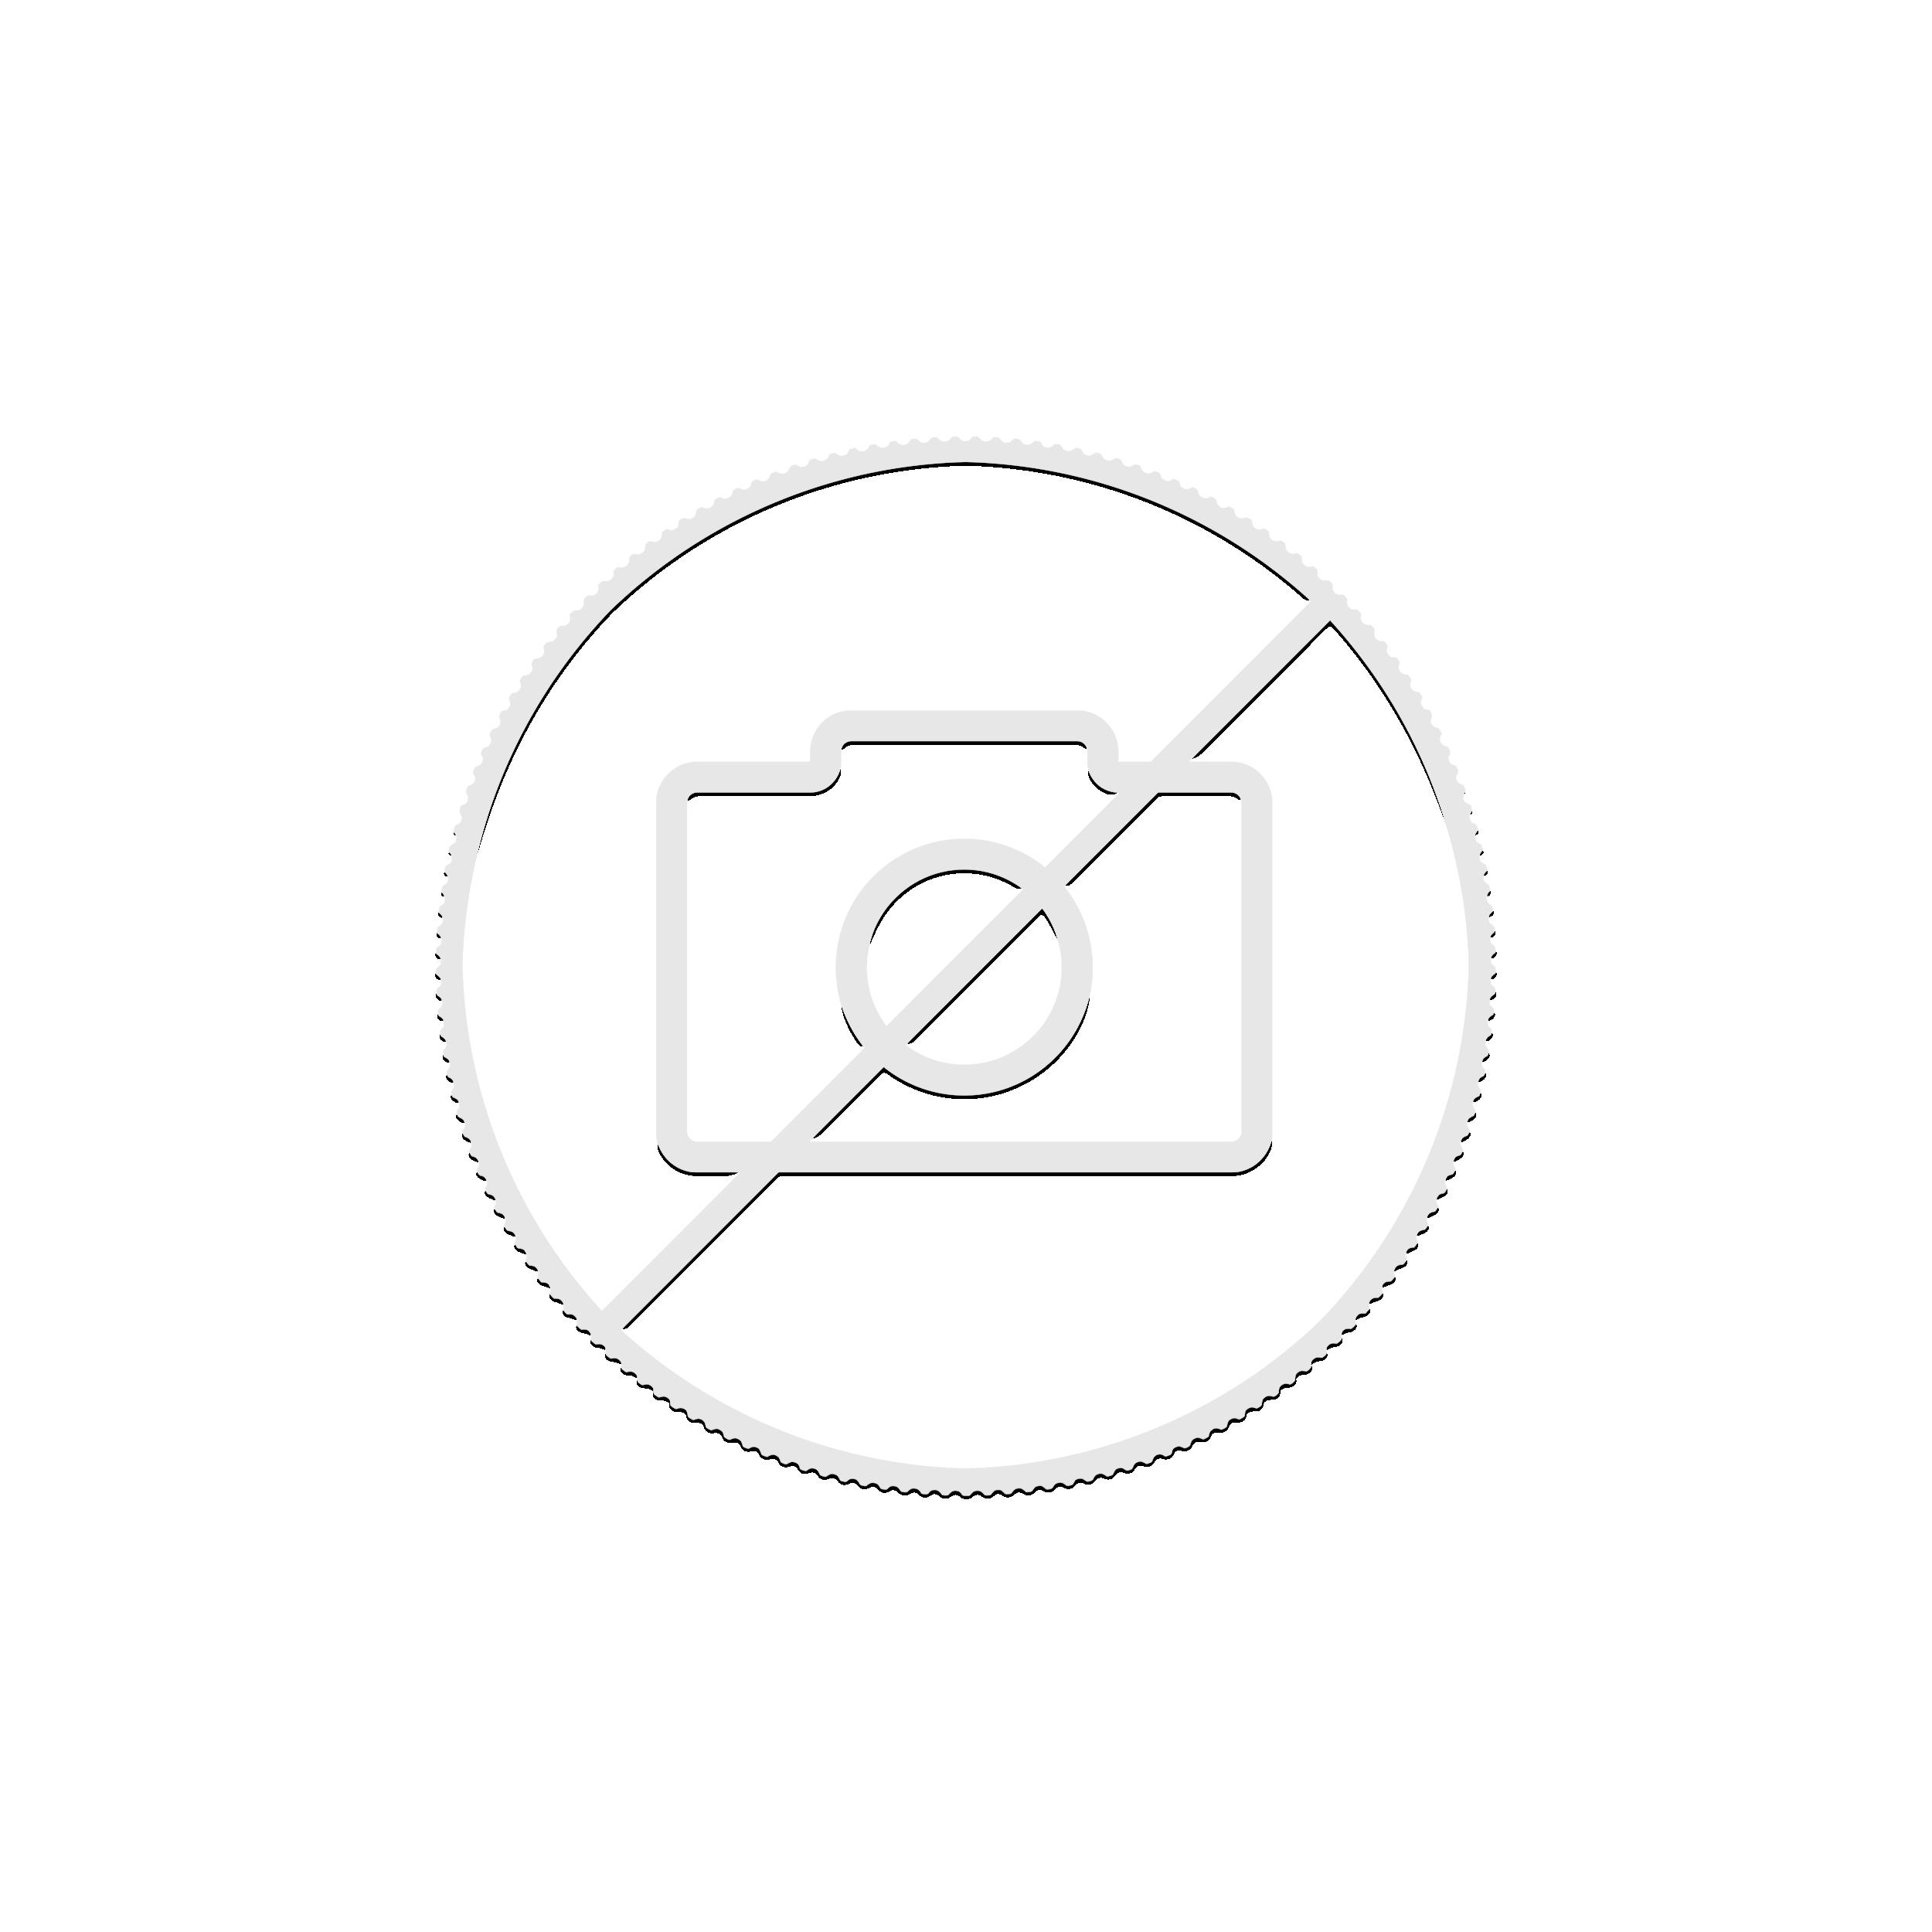 2 troy ounce silver coin Mandala panda 2021